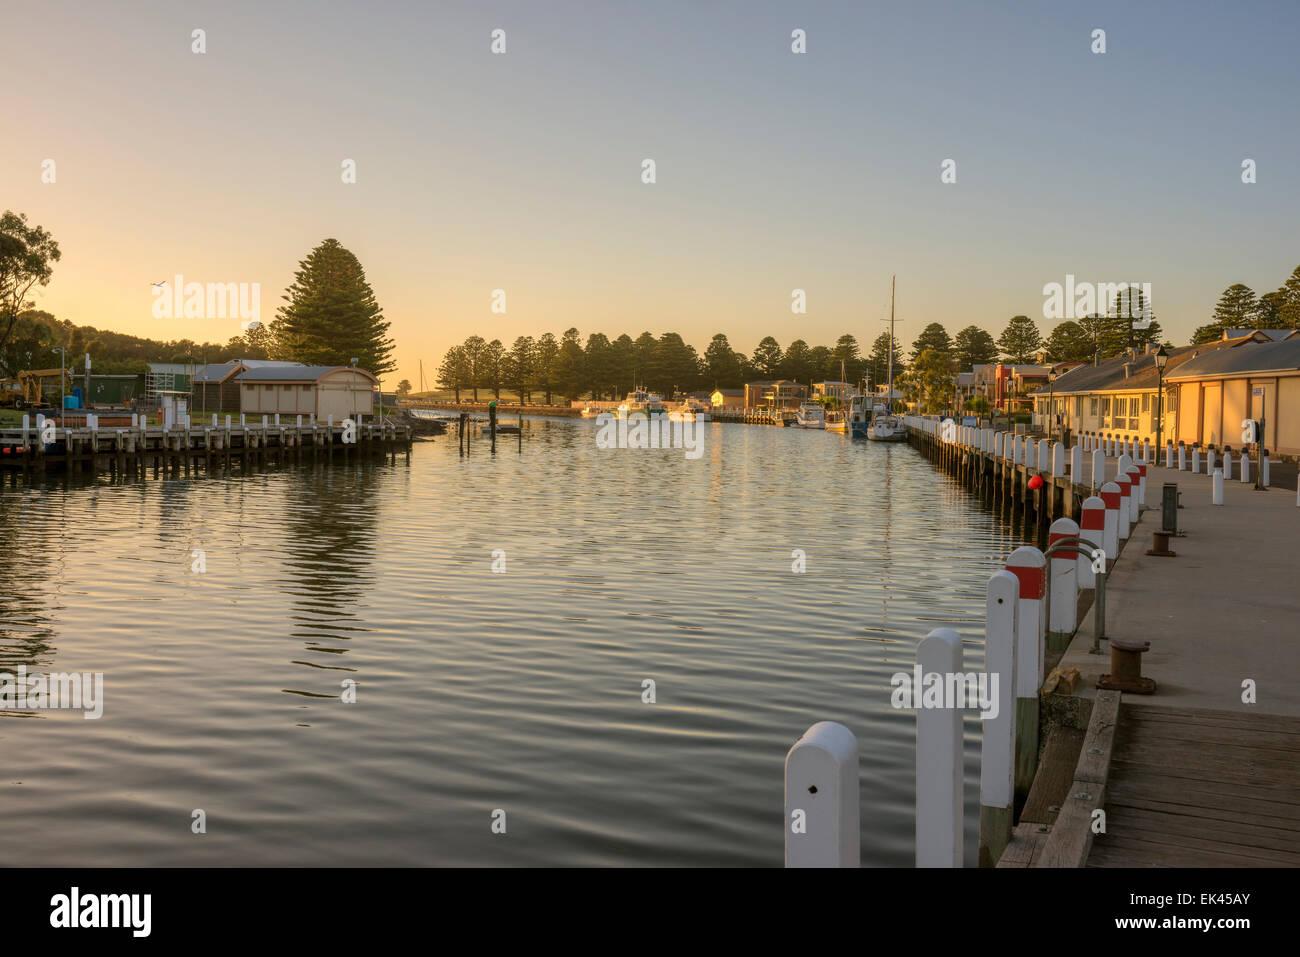 The village of Port Fairy on the Moyne River, Victoria Australia - Stock Image